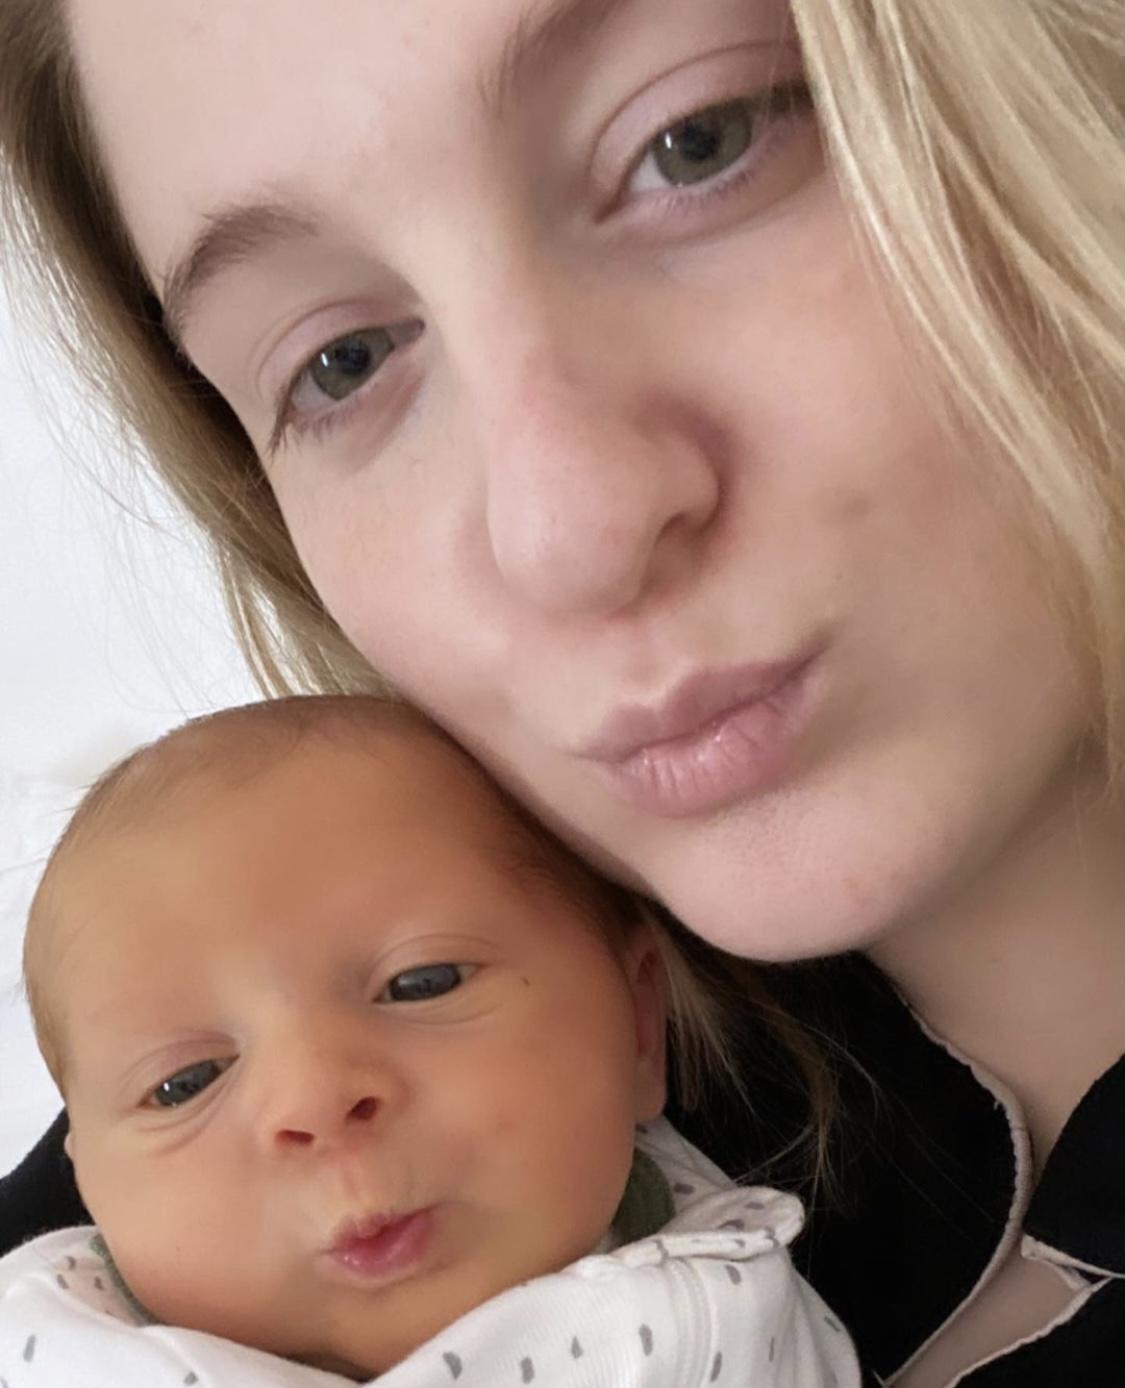 Meghan Trainor & Newborn Son Pose For ADORABLE Duckface Selfie